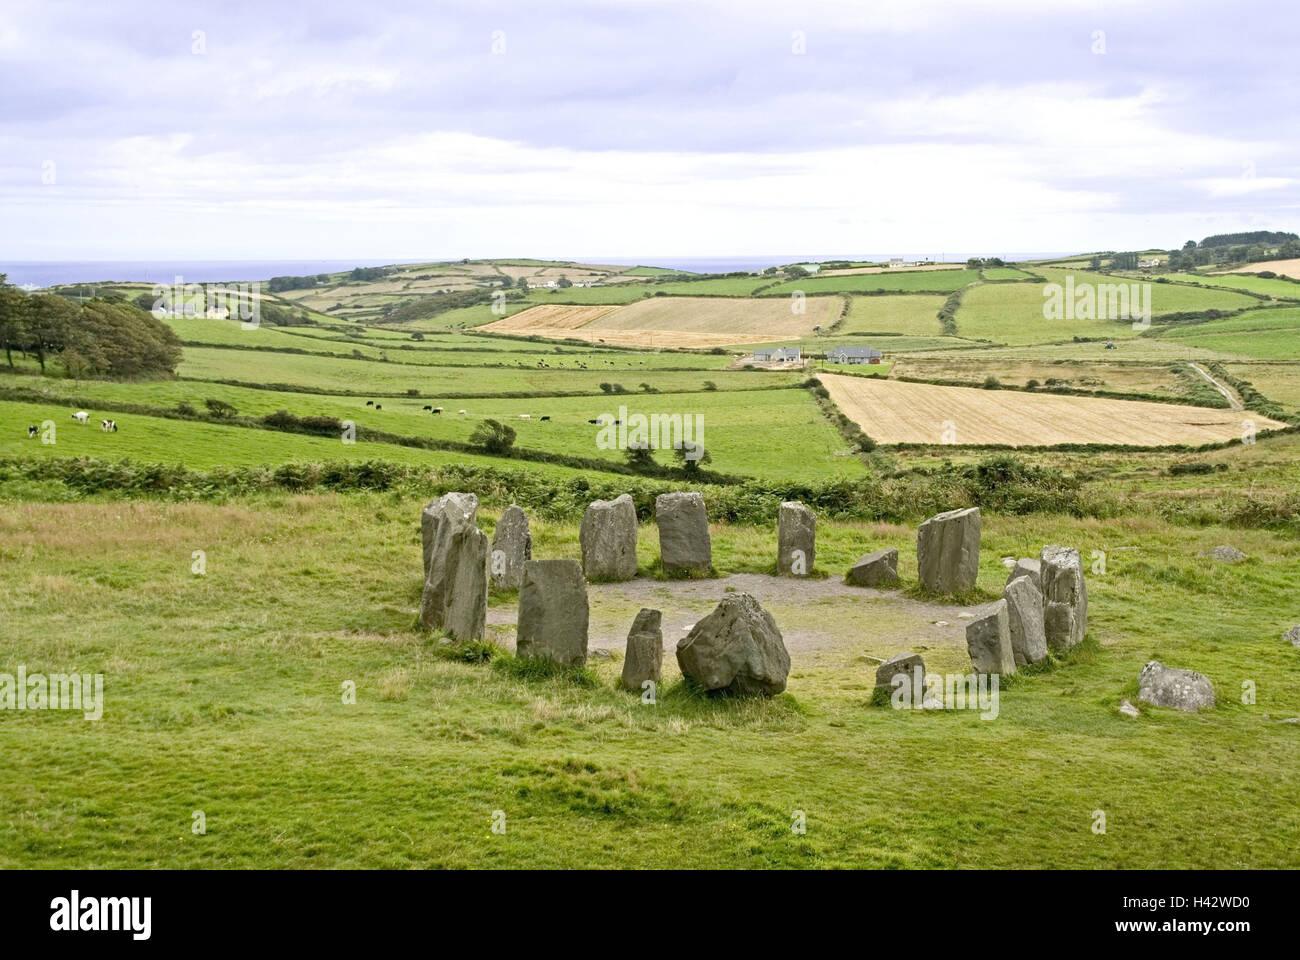 Ireland, Munster, scenery, mountain Drom, Stone Circle, stone circle, megalith, Bronze Age, antiquity, mysticism, - Stock Image